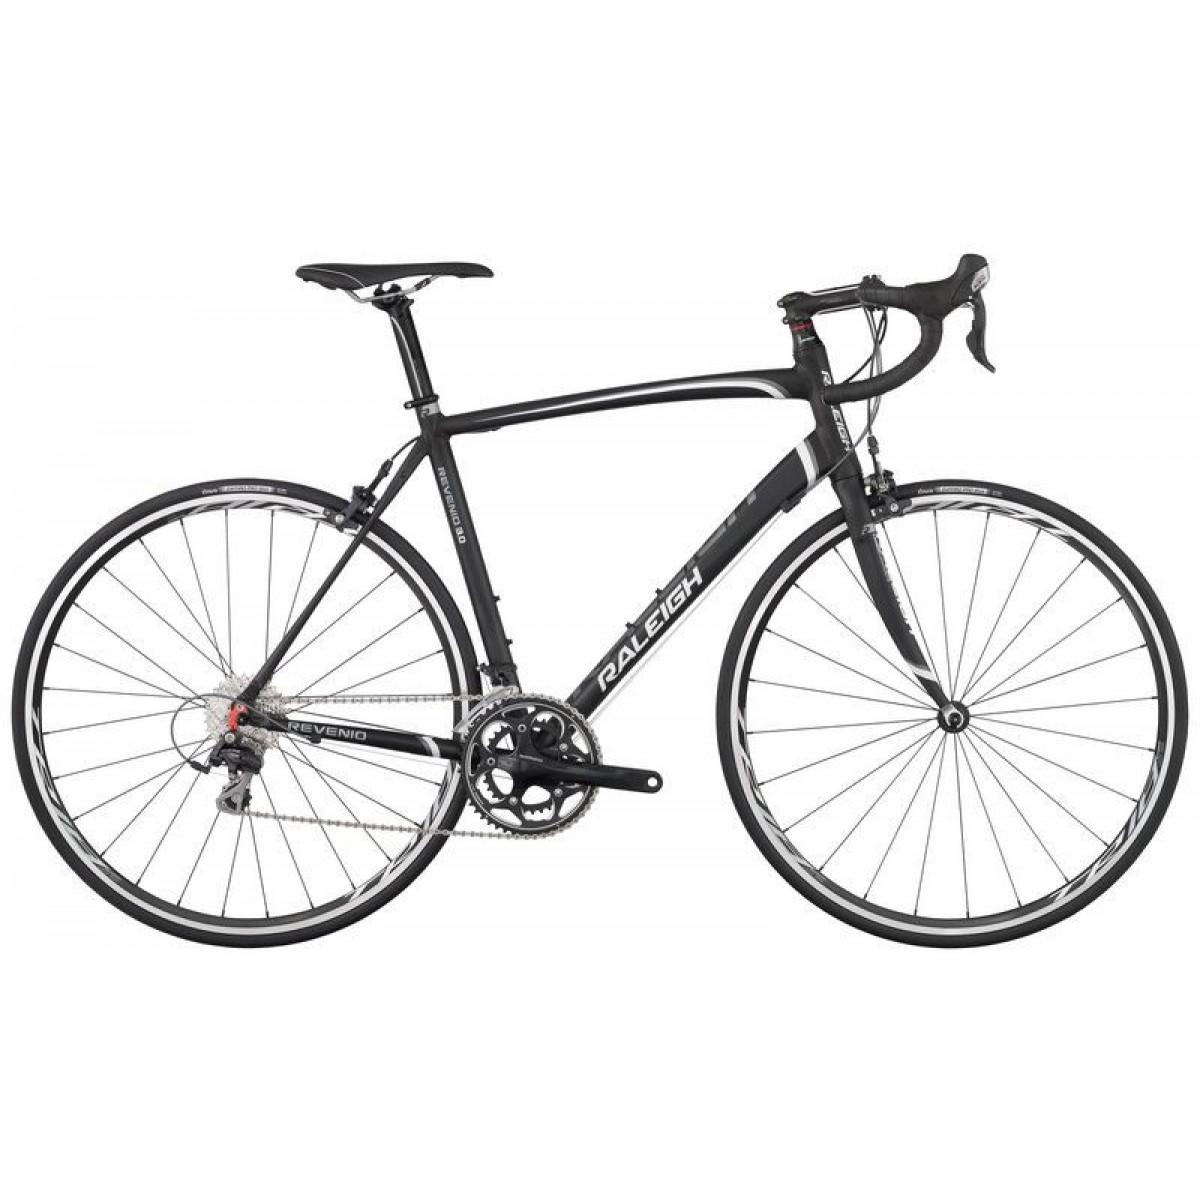 Raleigh Revenio 1 Road Bike 2013